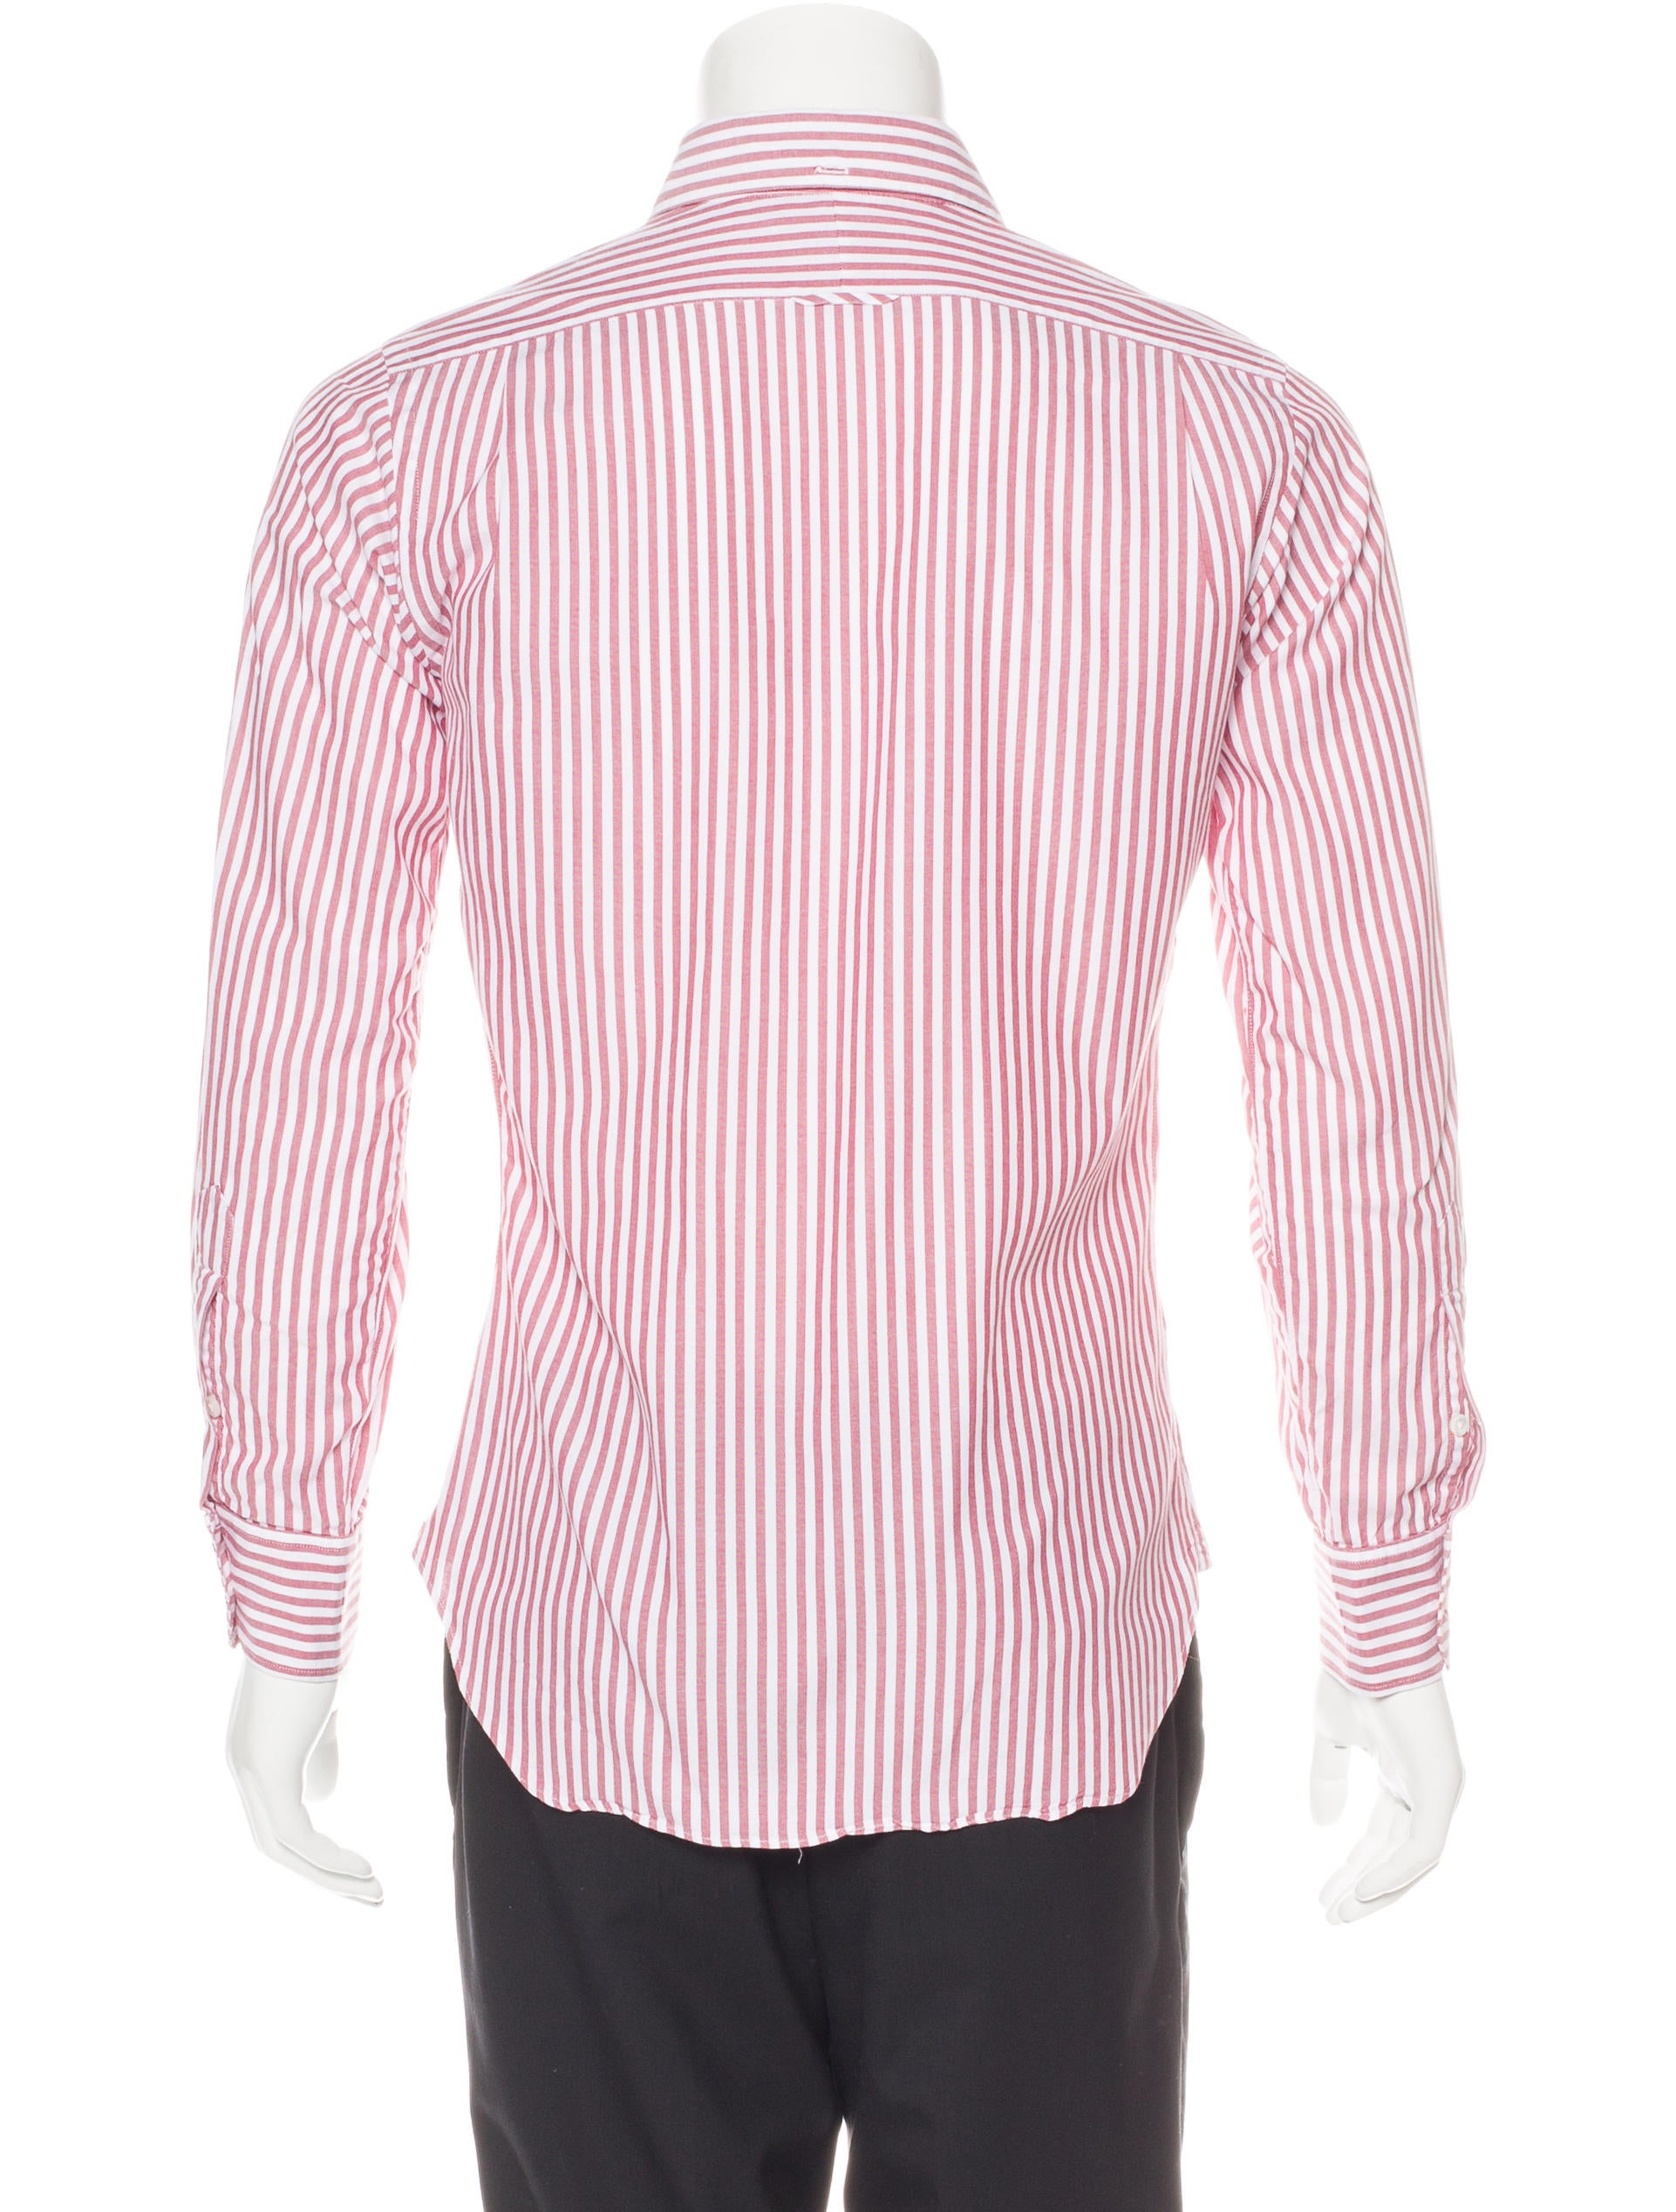 Thom browne striped woven shirt clothing tho21706 for Thom browne shirt sale